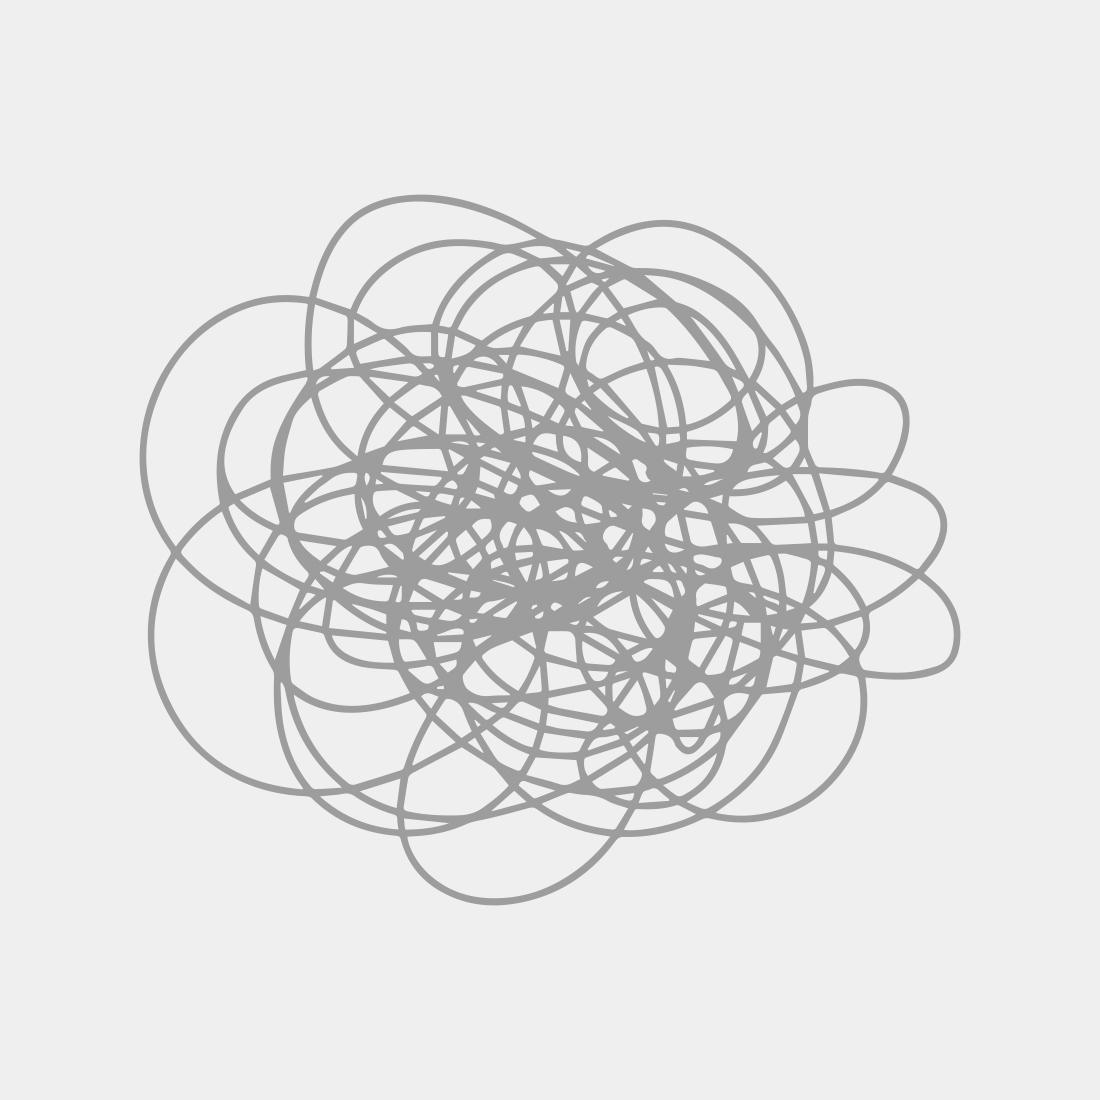 Albert Irvin OBE RA Untitled opus w.32